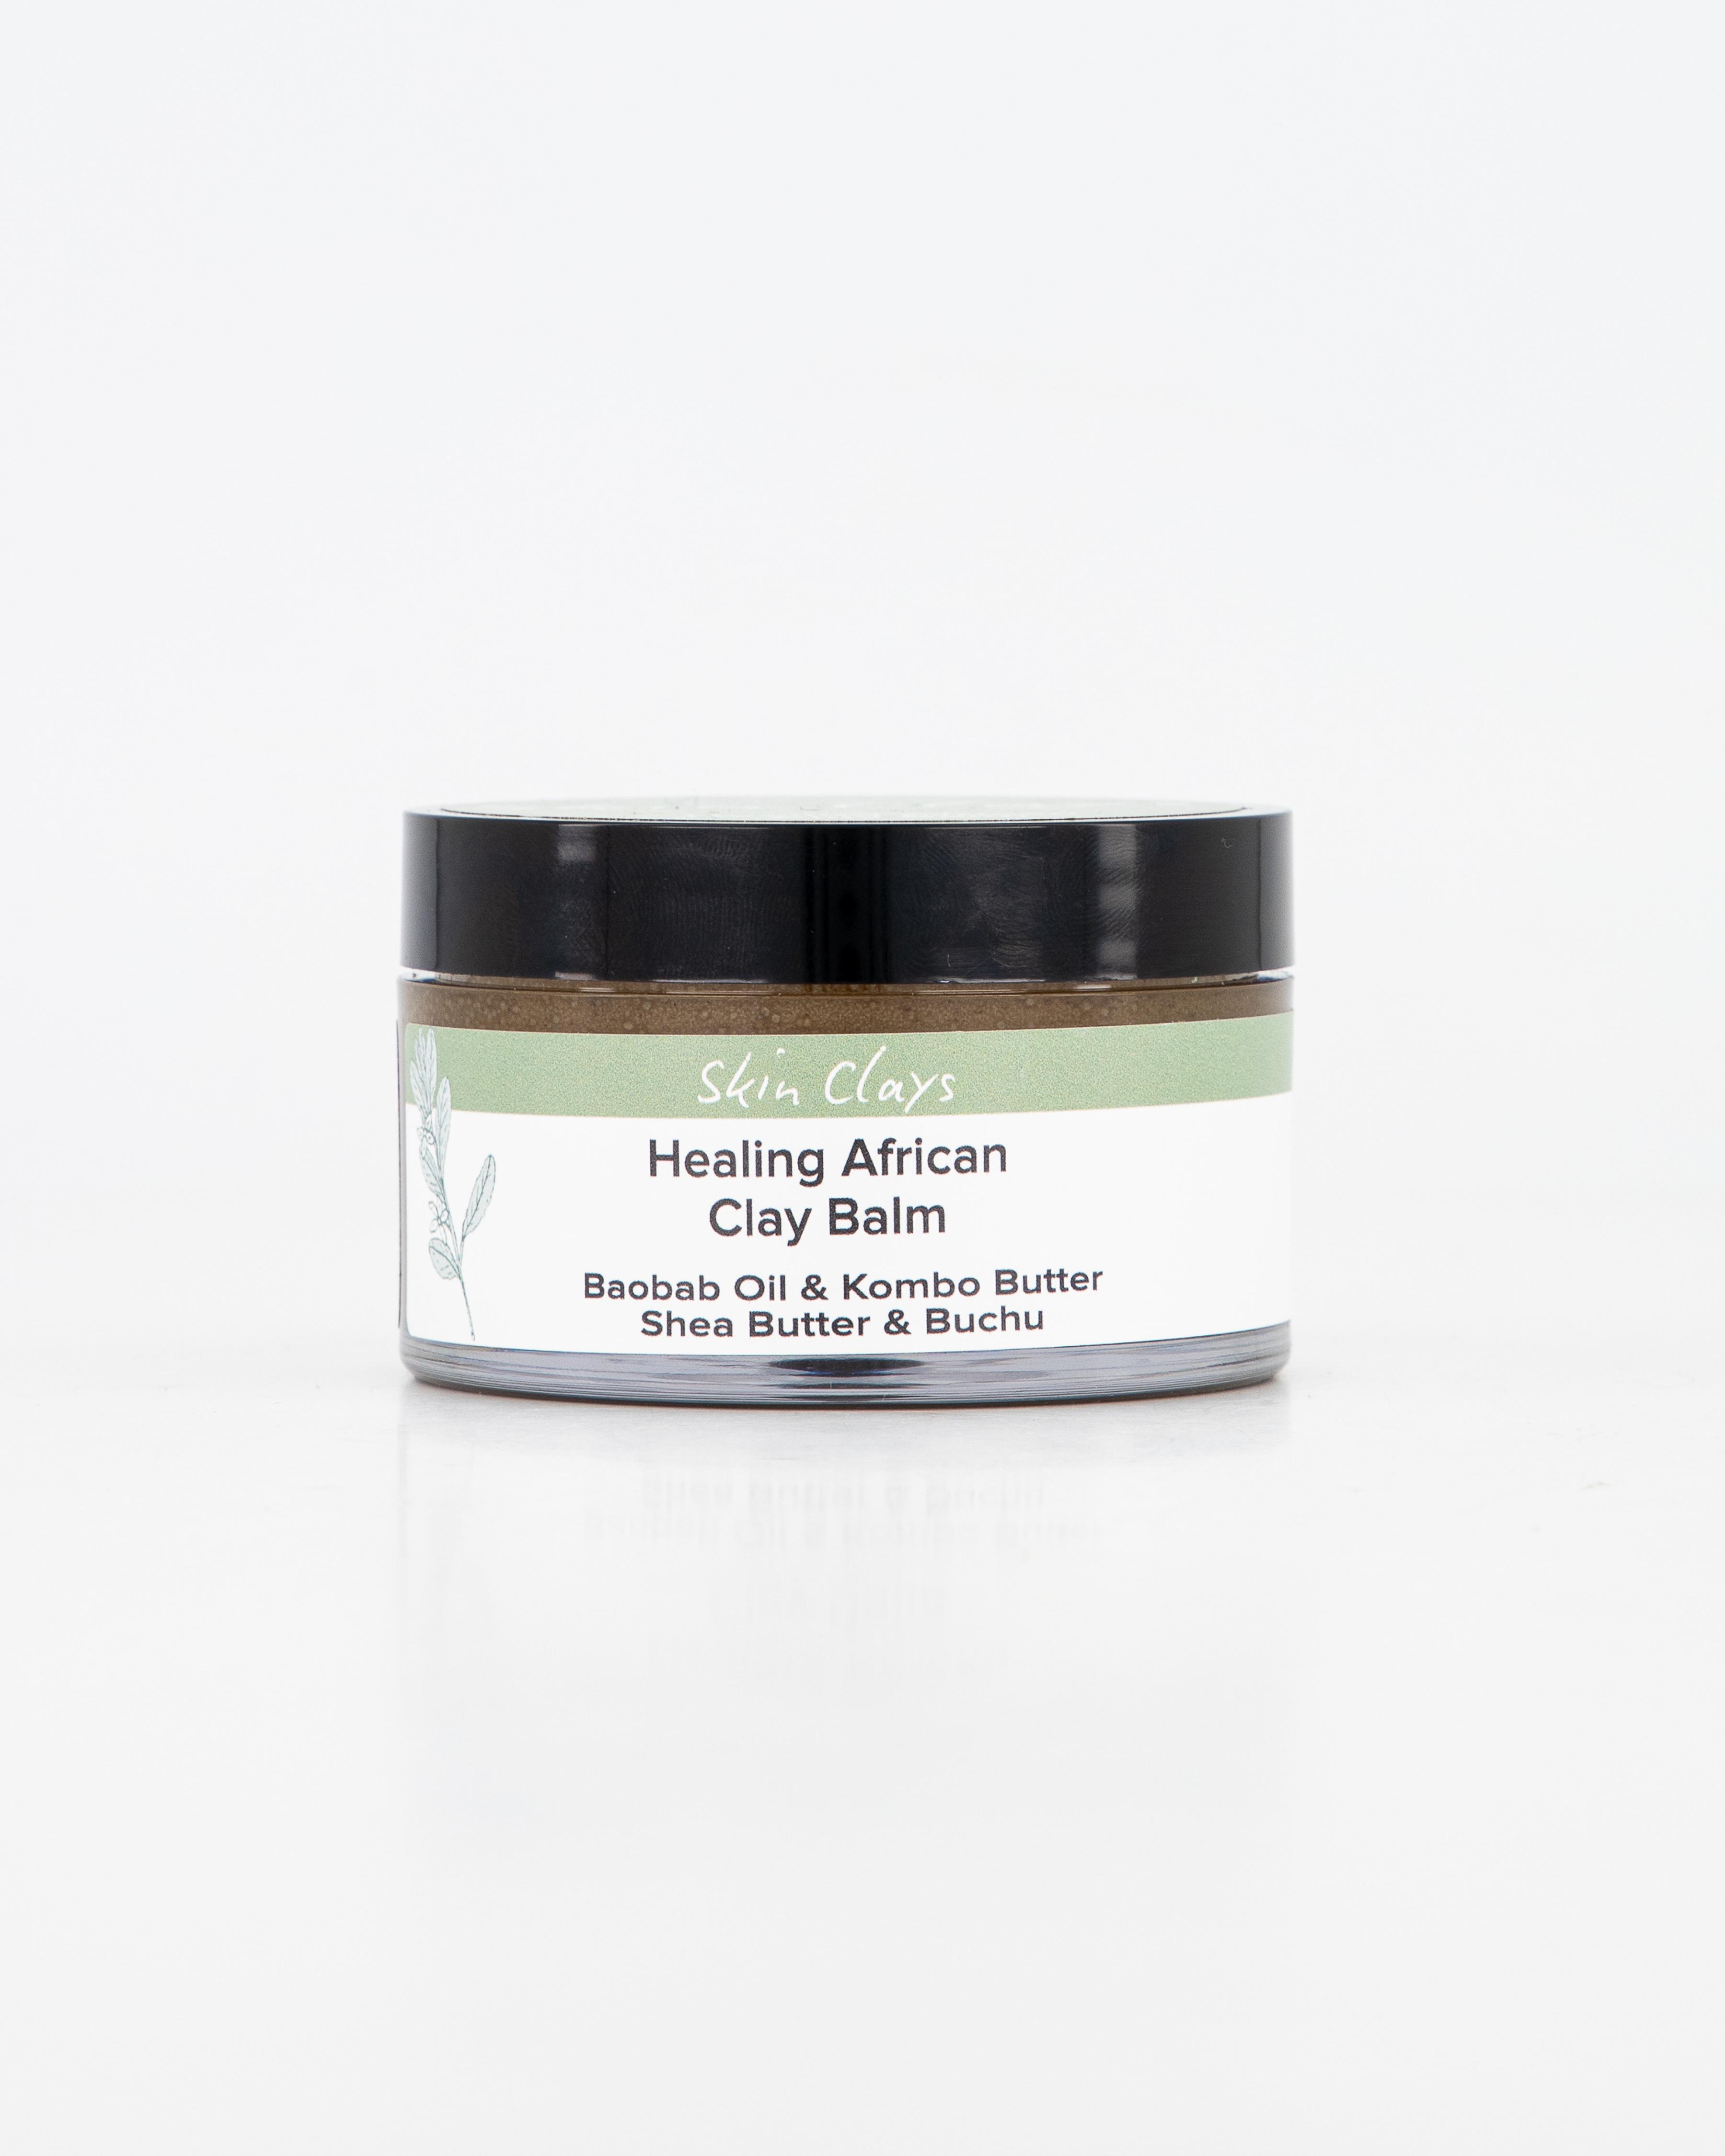 Healing African Clay Balm